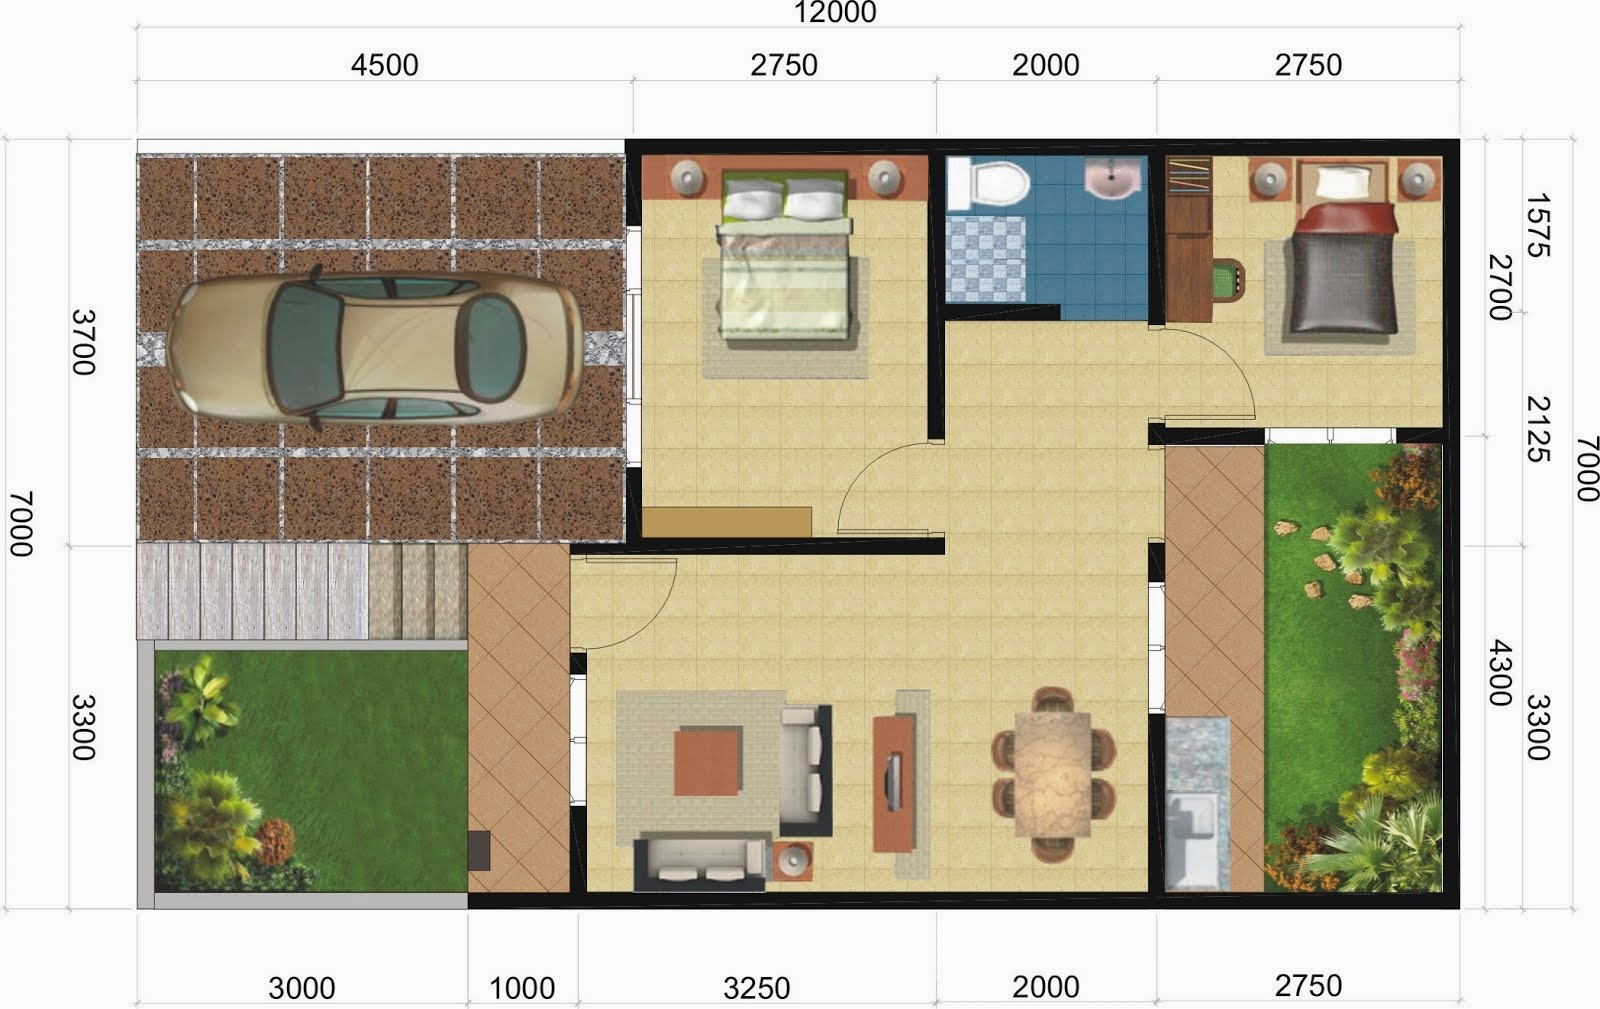 104 Gambar Rumah Minimalis Sederhana Ukuran 7x9 | Gambar ...